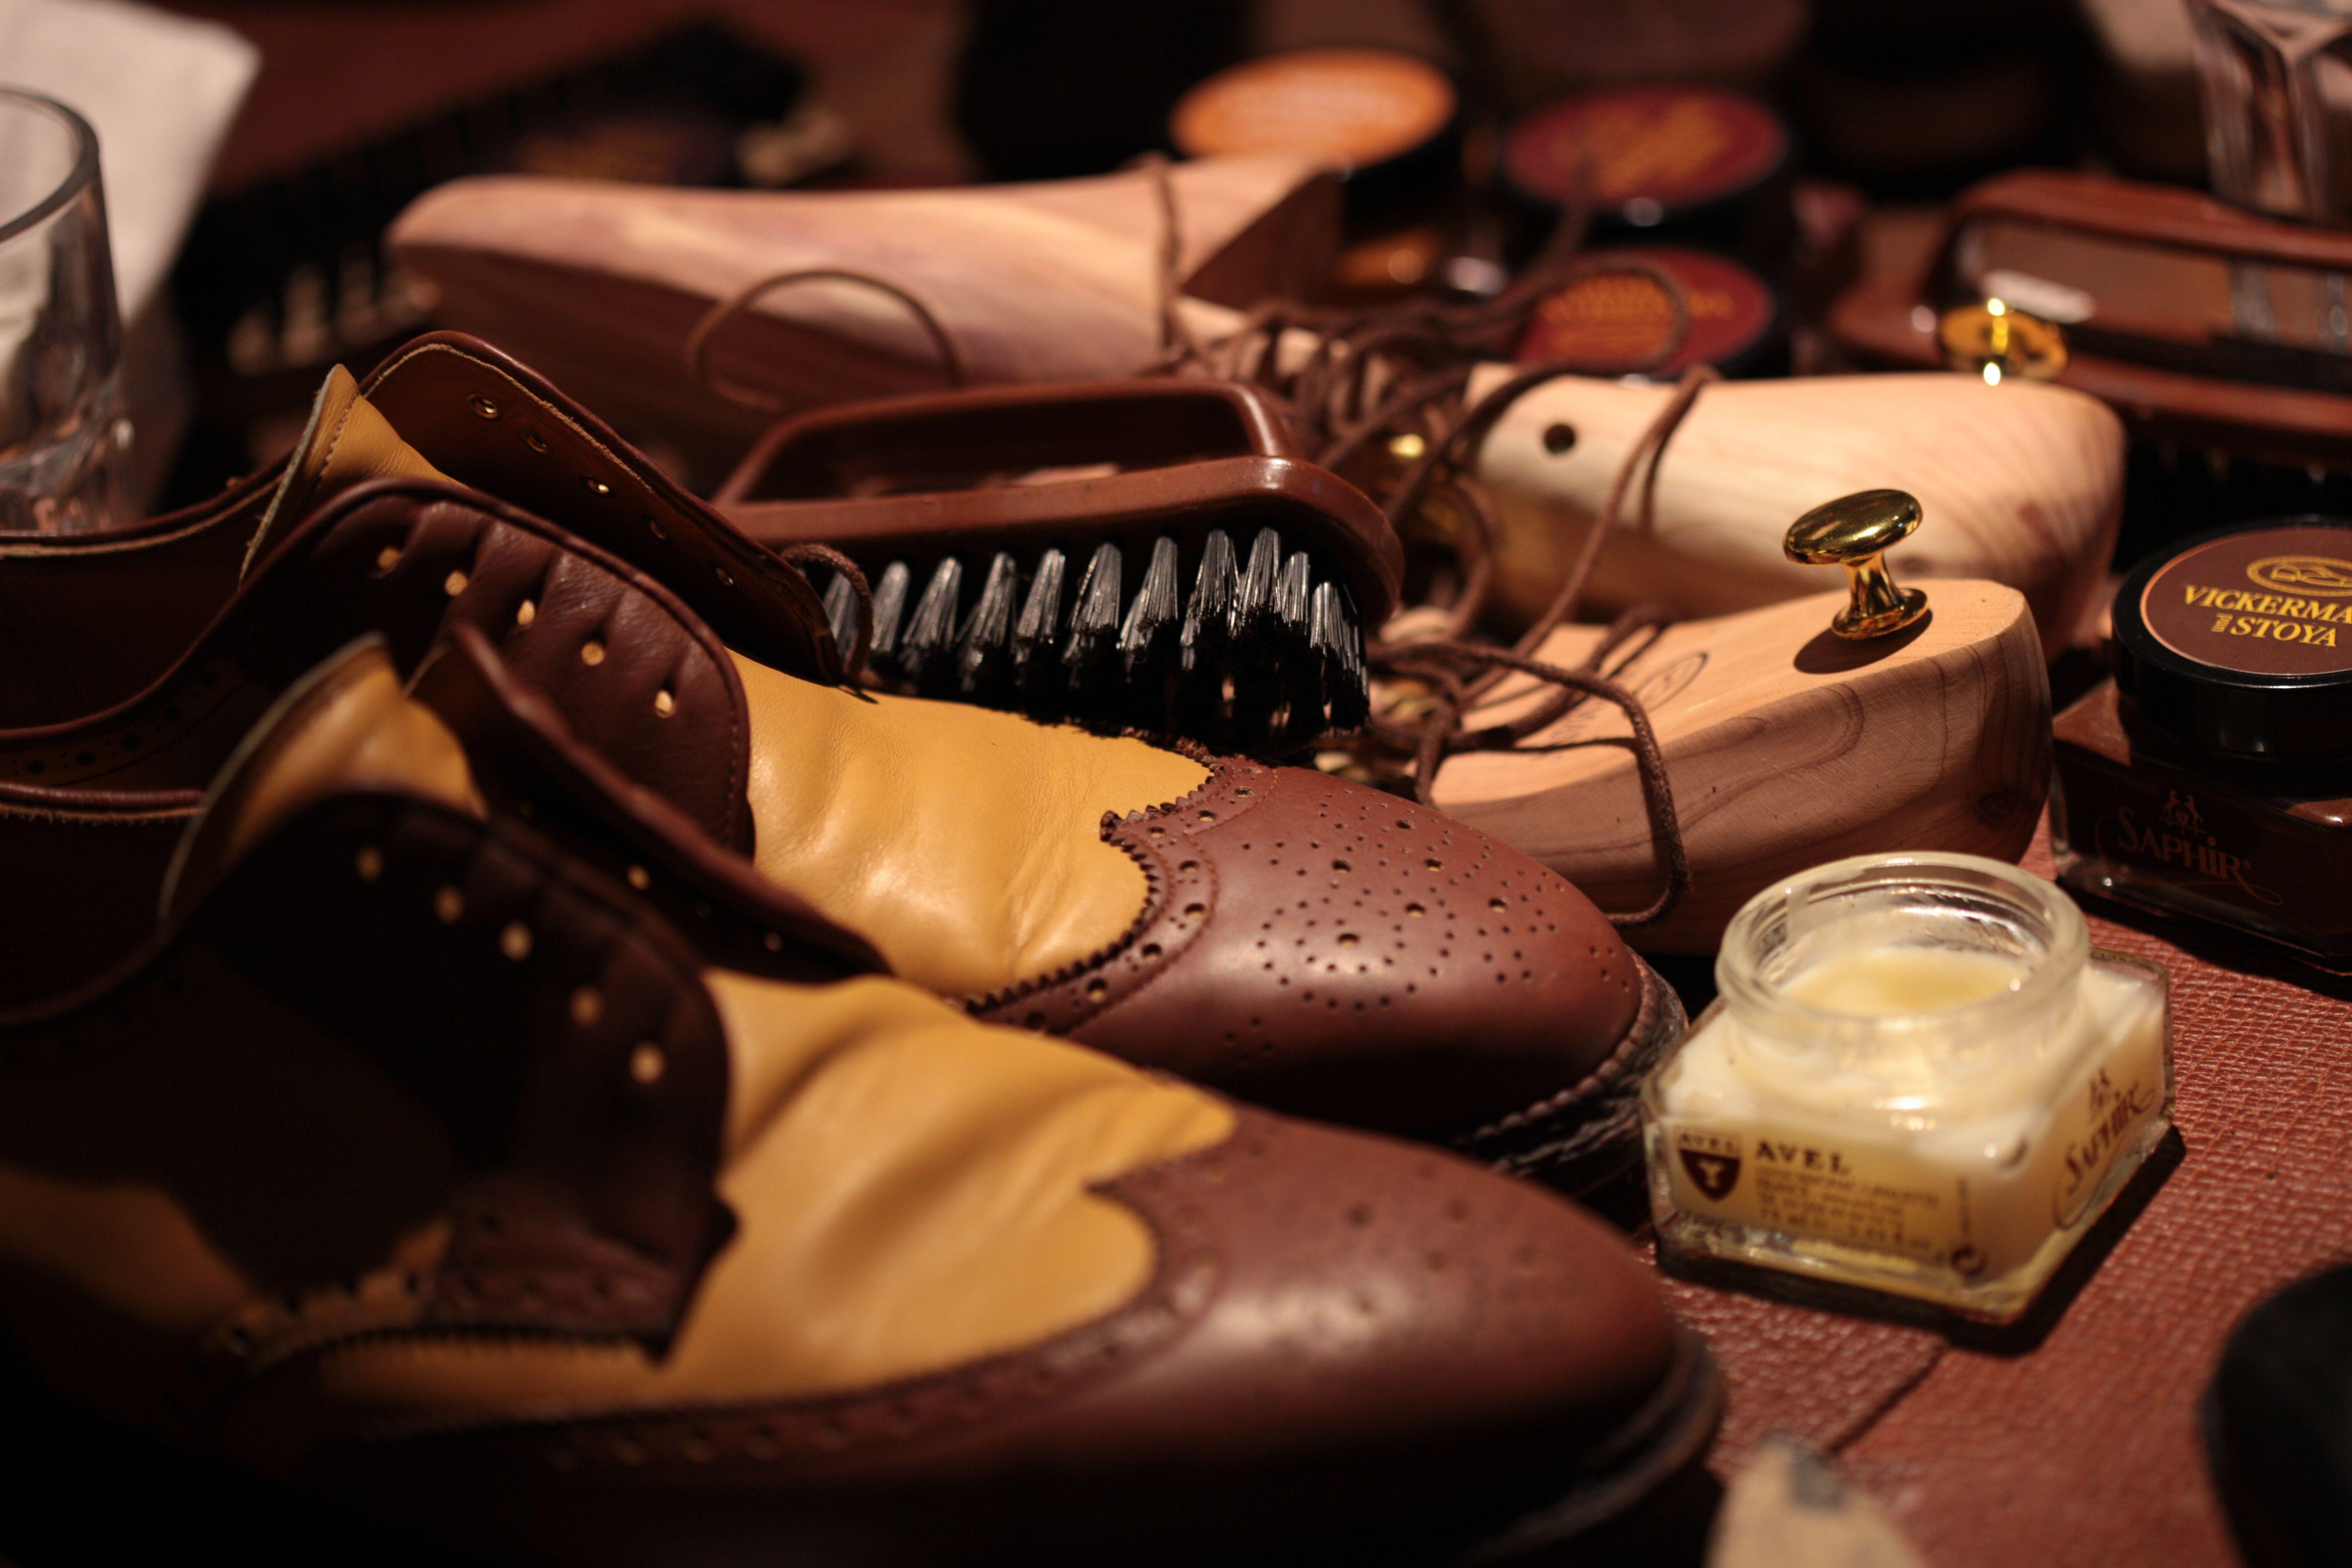 Schuhpflegekurse  |  Vickermann & Stoya Maßschuhe - Schuhmacher, Schuhreparaturen, Schuhmanufaktur